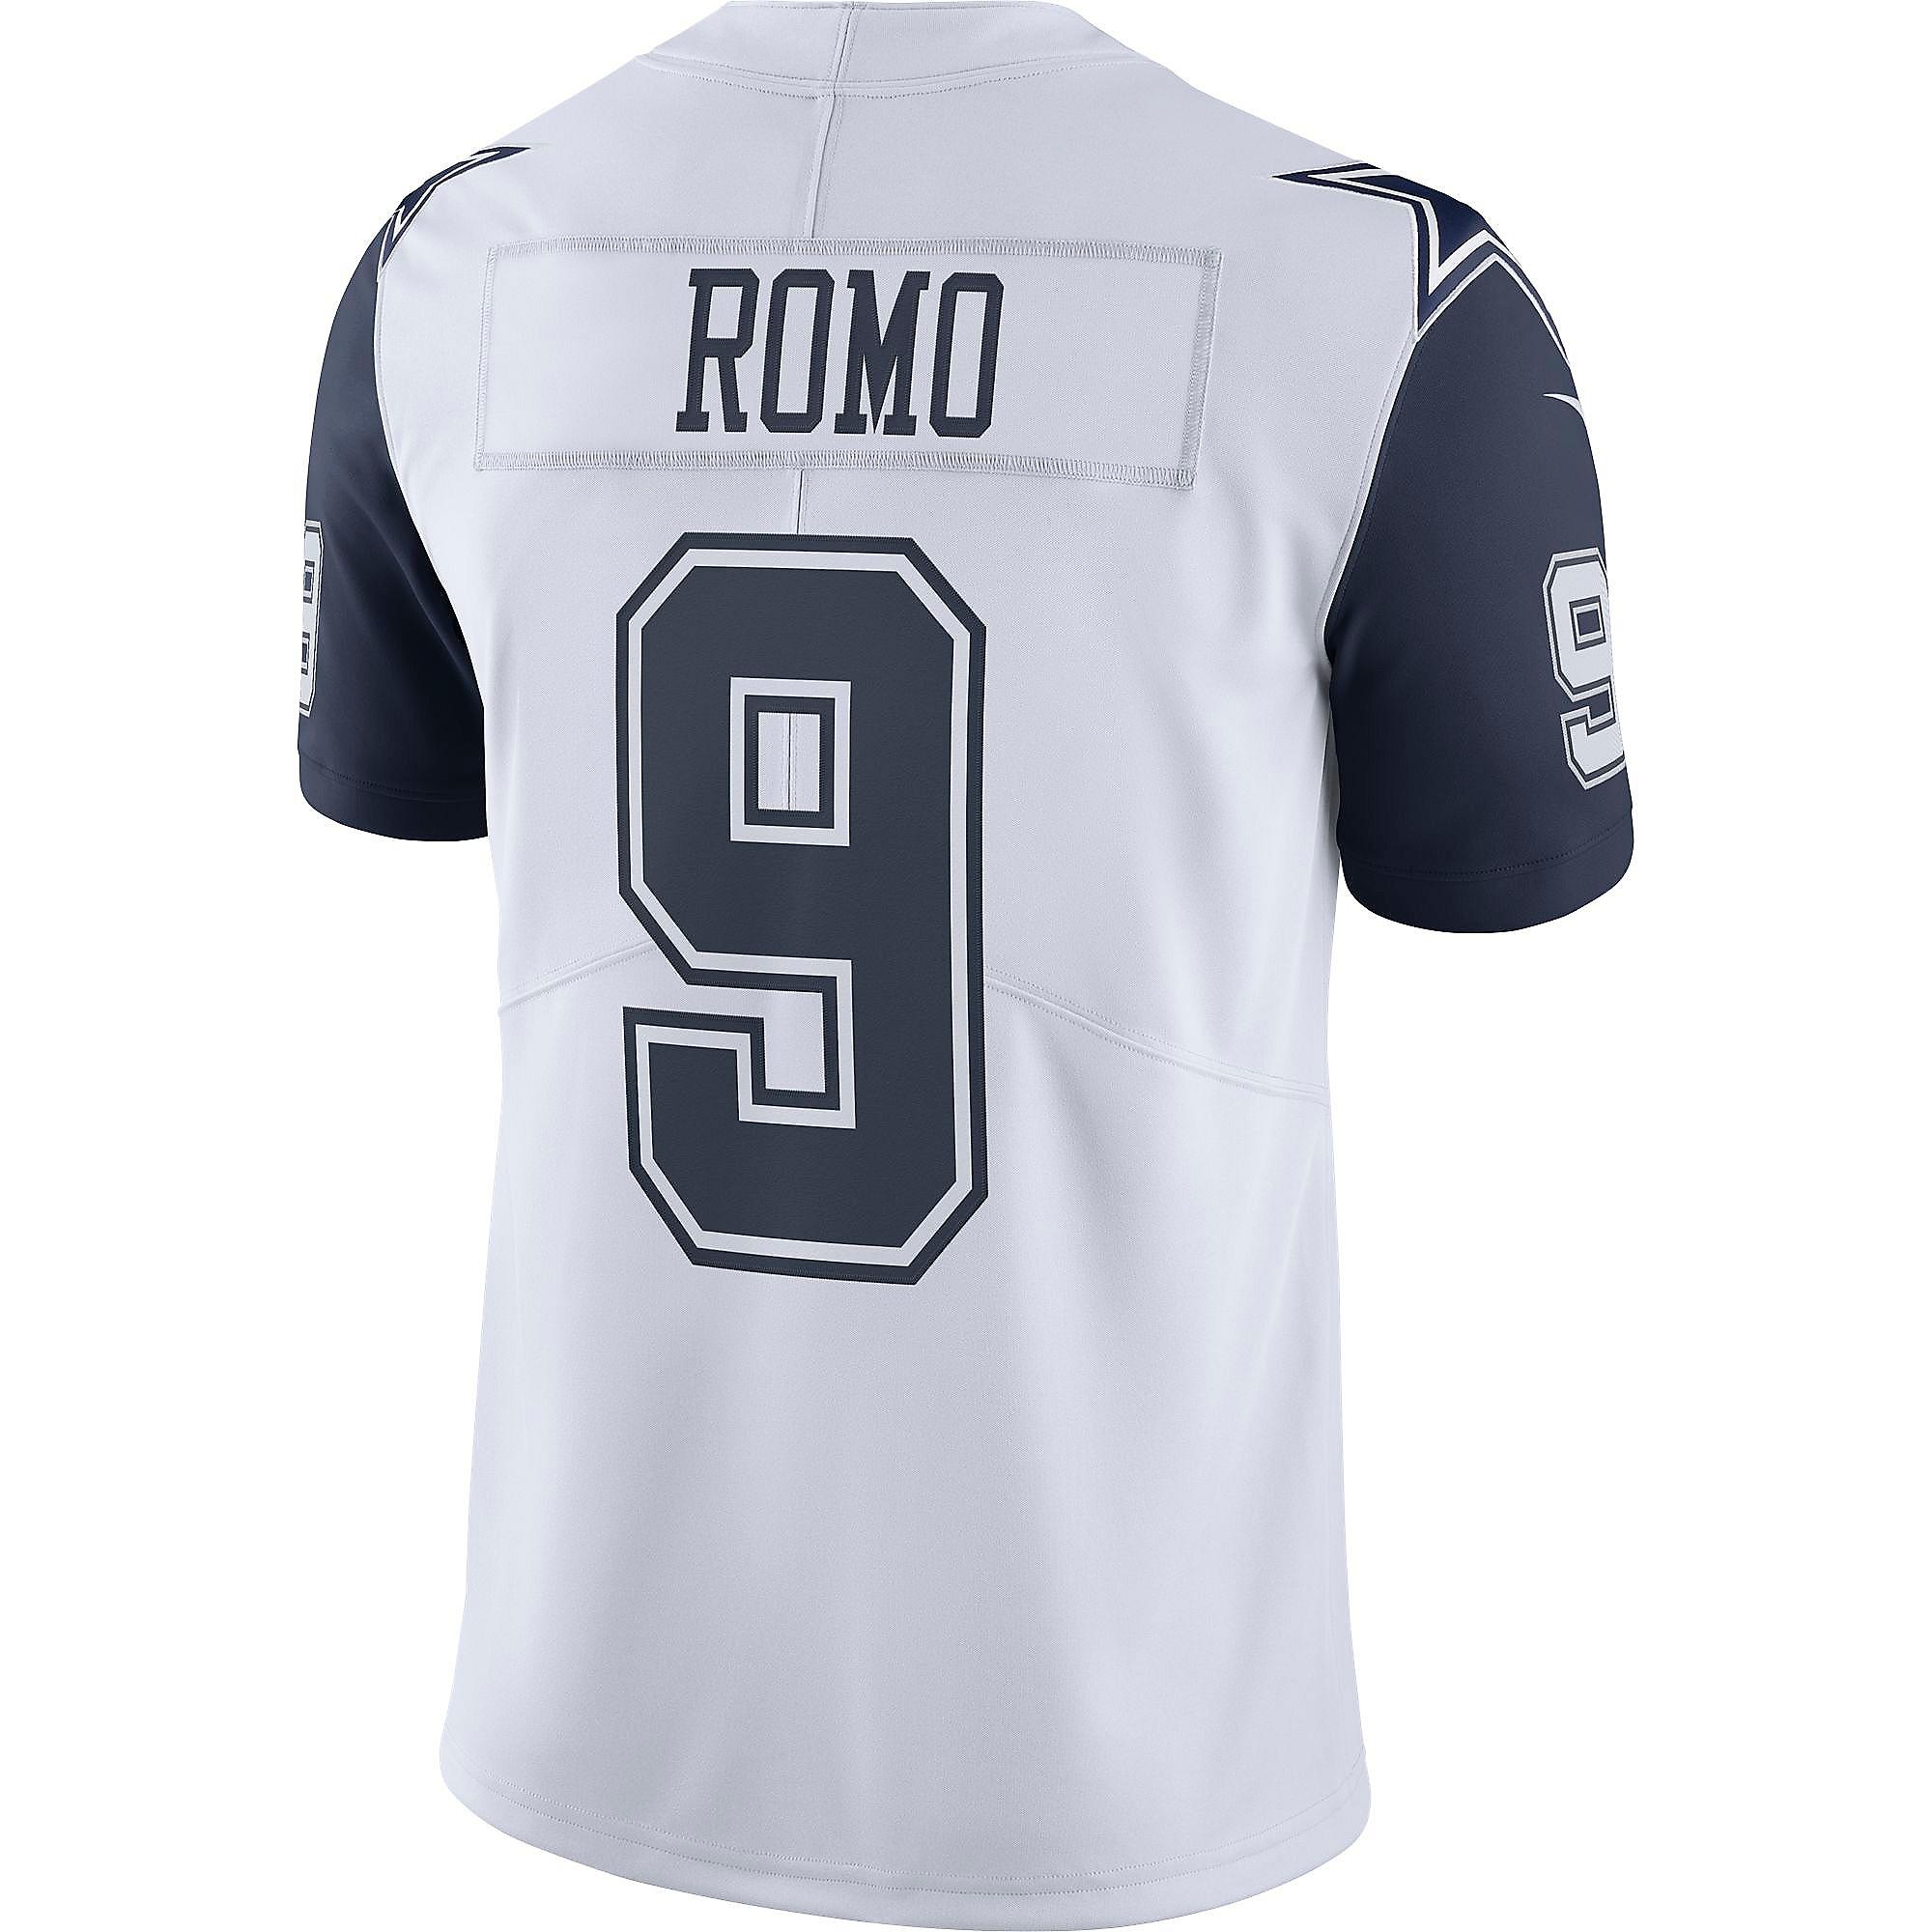 5a389cb2e Dallas Cowboys Tony Romo #9 Nike XC1 Color Rush Jersey | Dallas Cowboys Pro  Shop